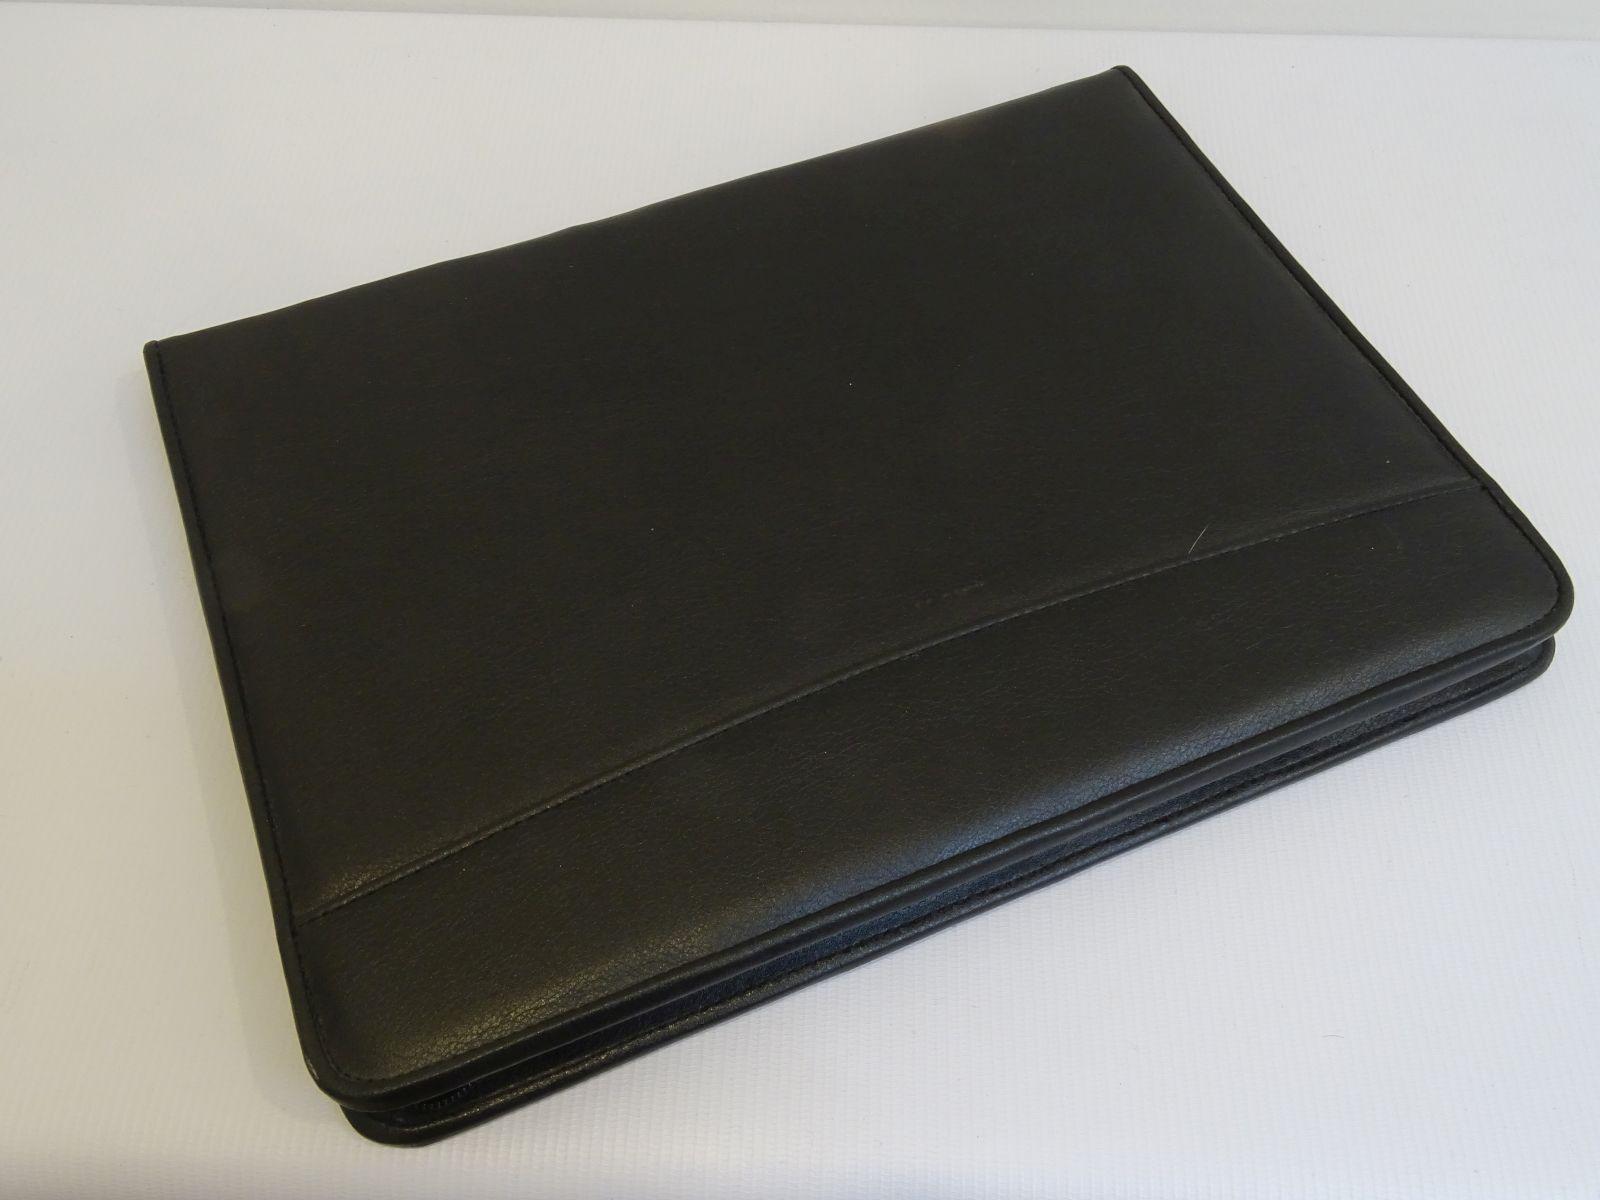 DSC00721.JPG (1600×1200)